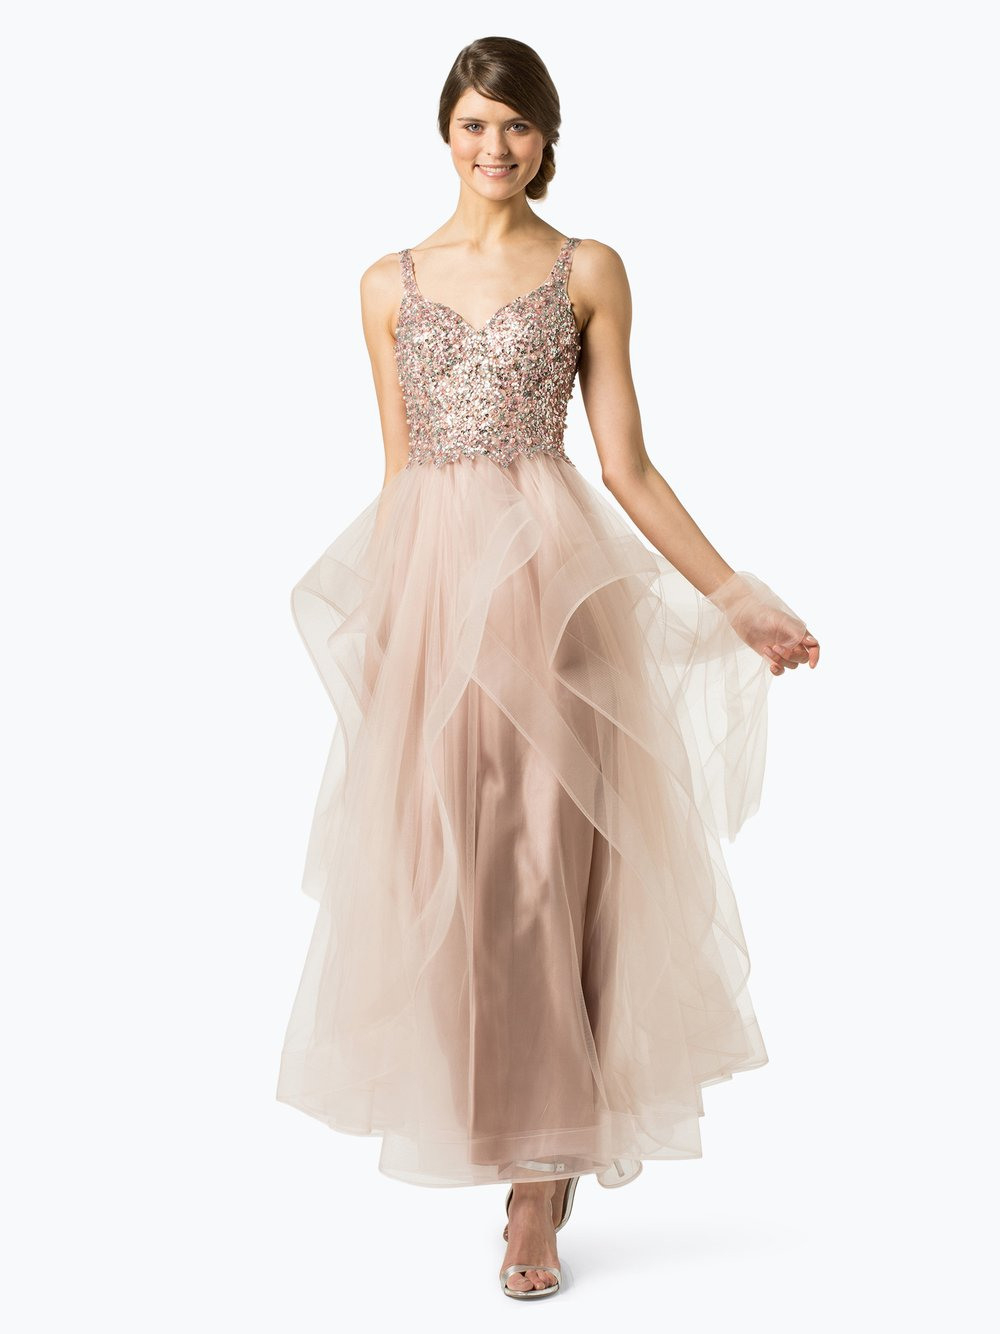 10 Genial Unique Damen Abendkleid Bester Preis17 Coolste Unique Damen Abendkleid Bester Preis